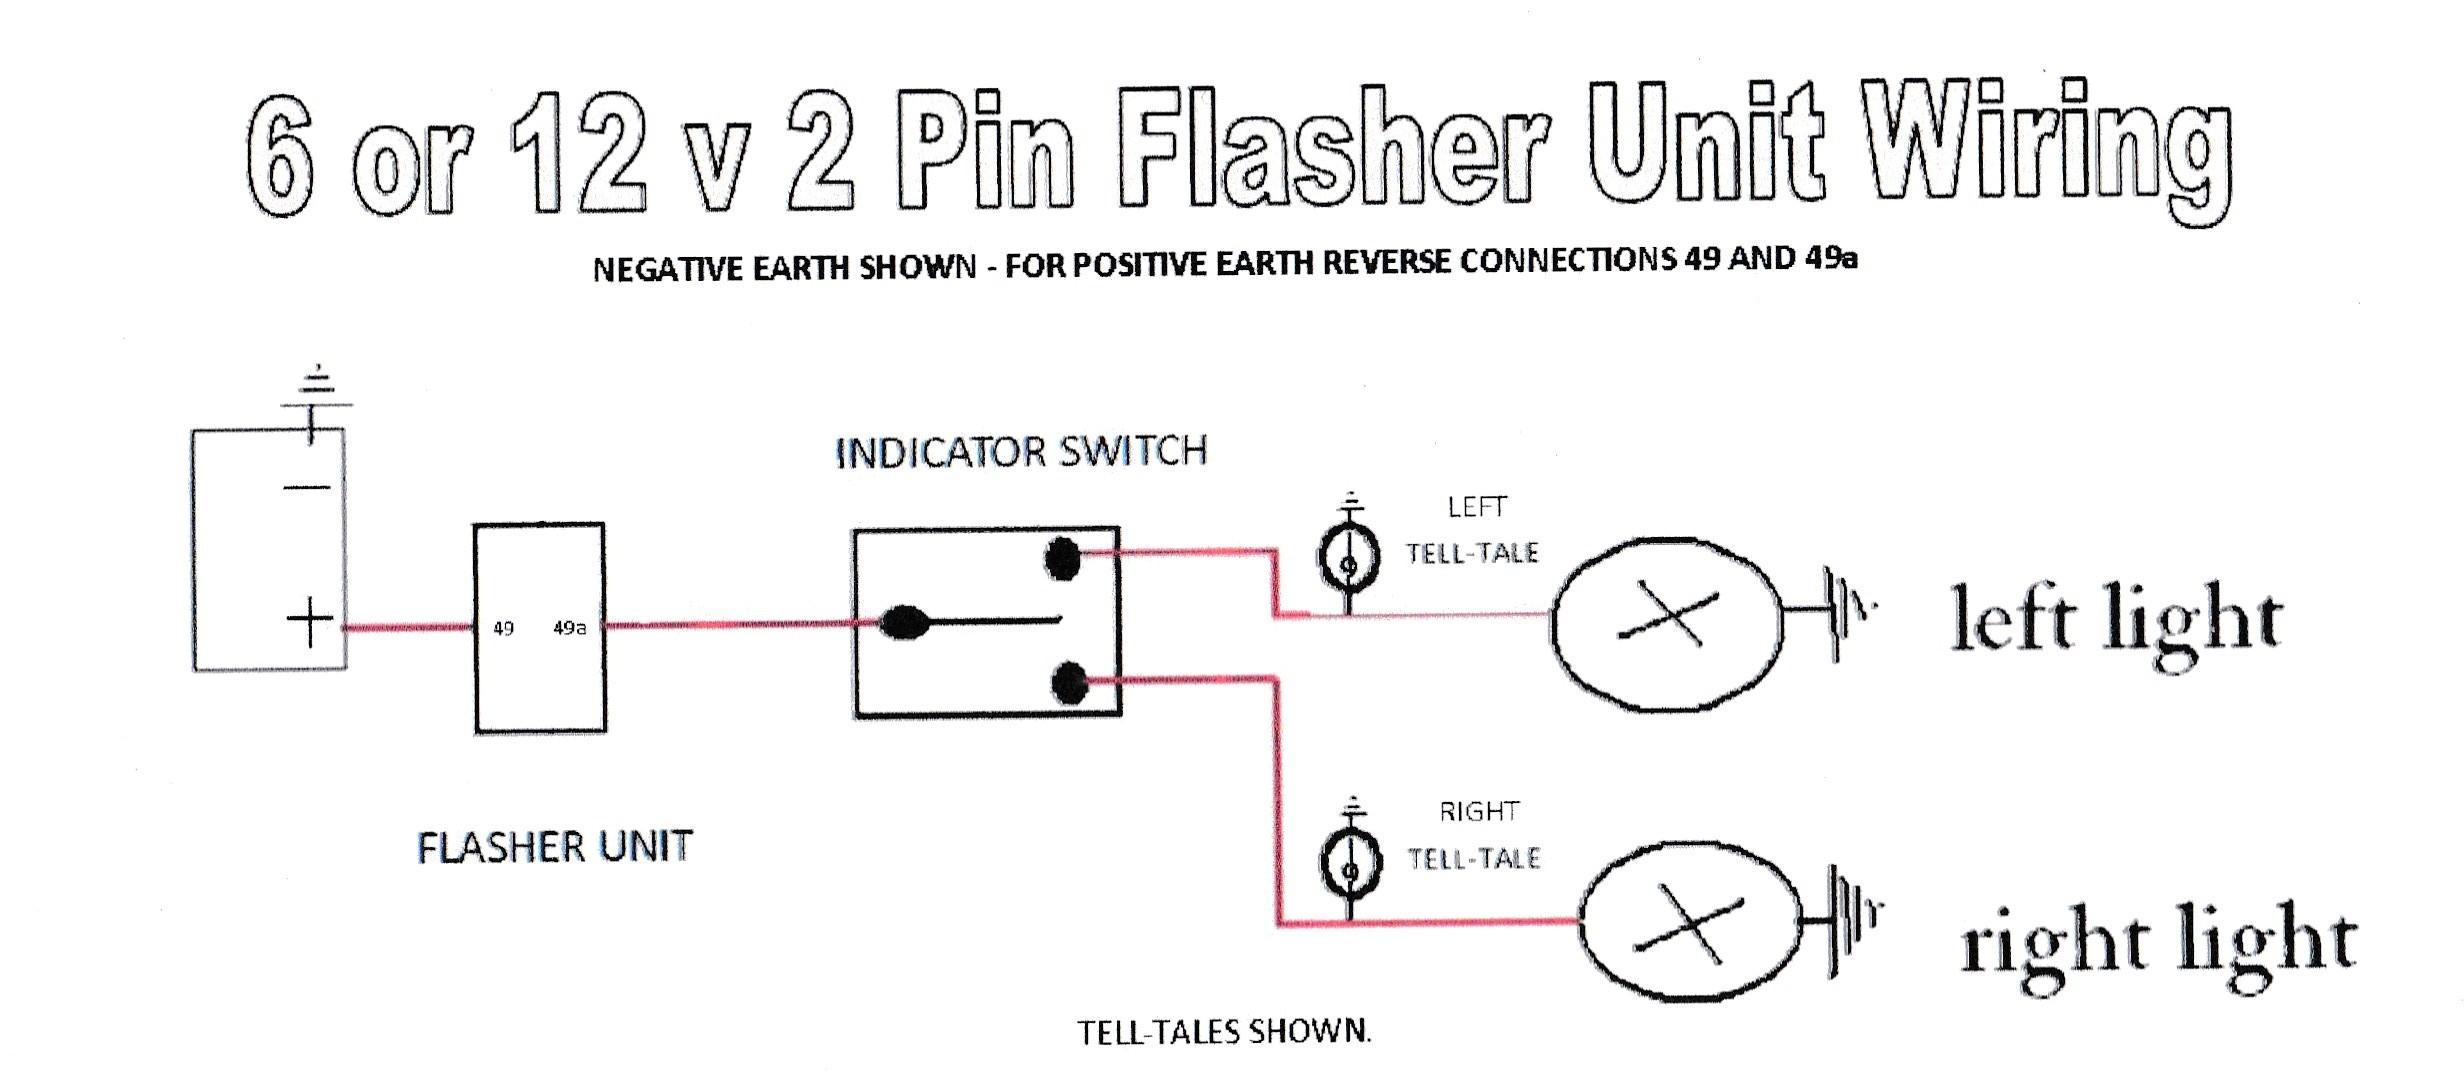 pole mounted controller wiring diagram wire center u2022 rh rkstartup co 3-Pin DMX Wiring-Diagram Door Alarm Controller Wiring Diagram